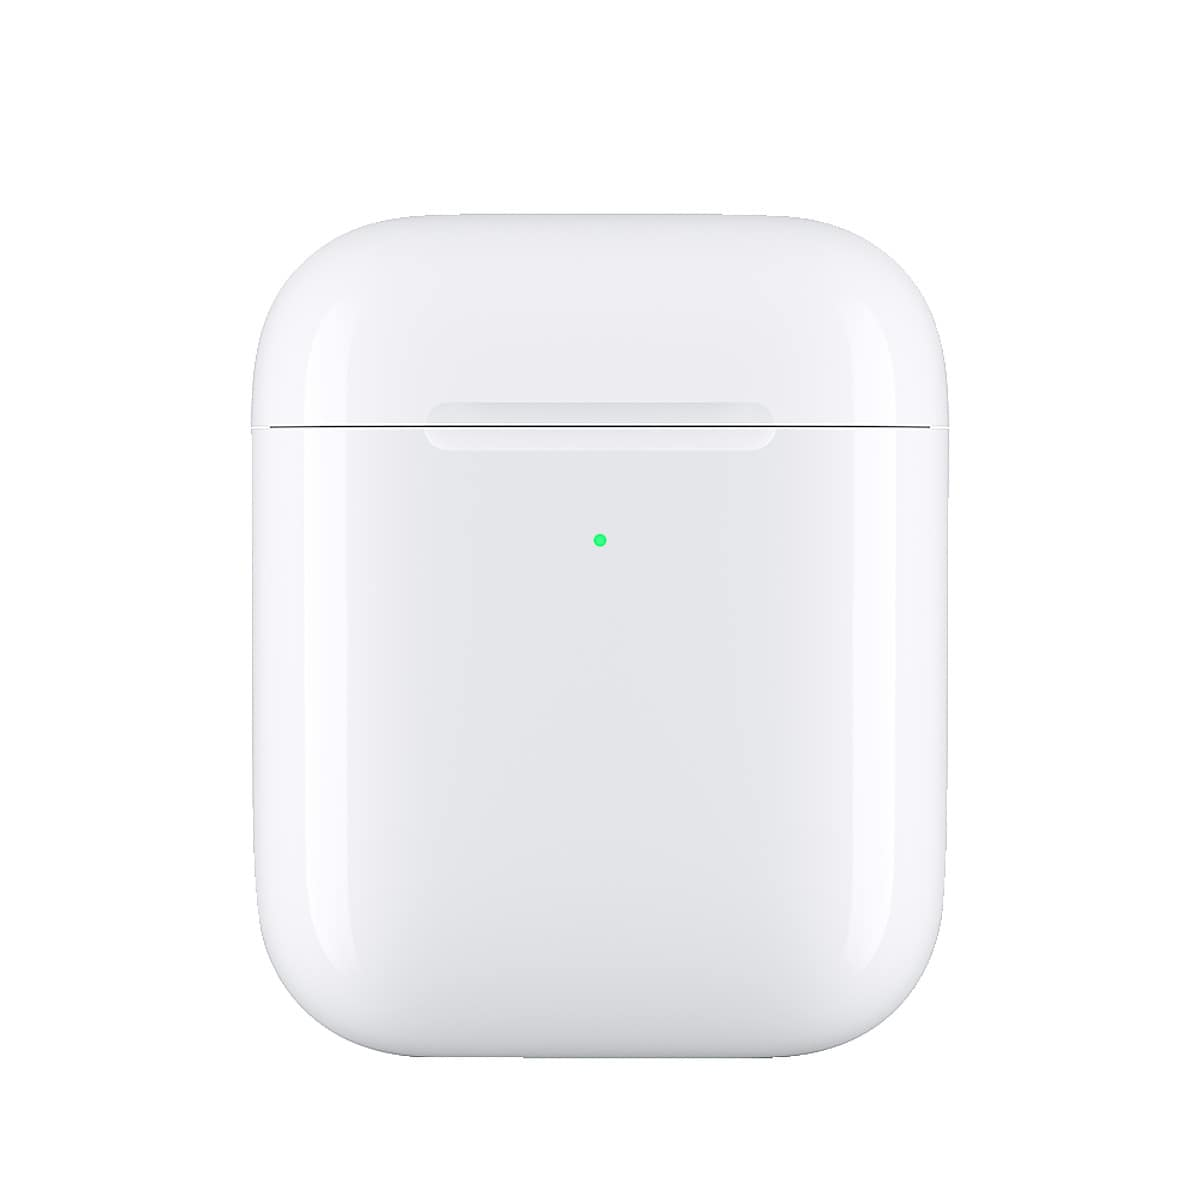 Apple trådlöst laddningsetui för AirPods